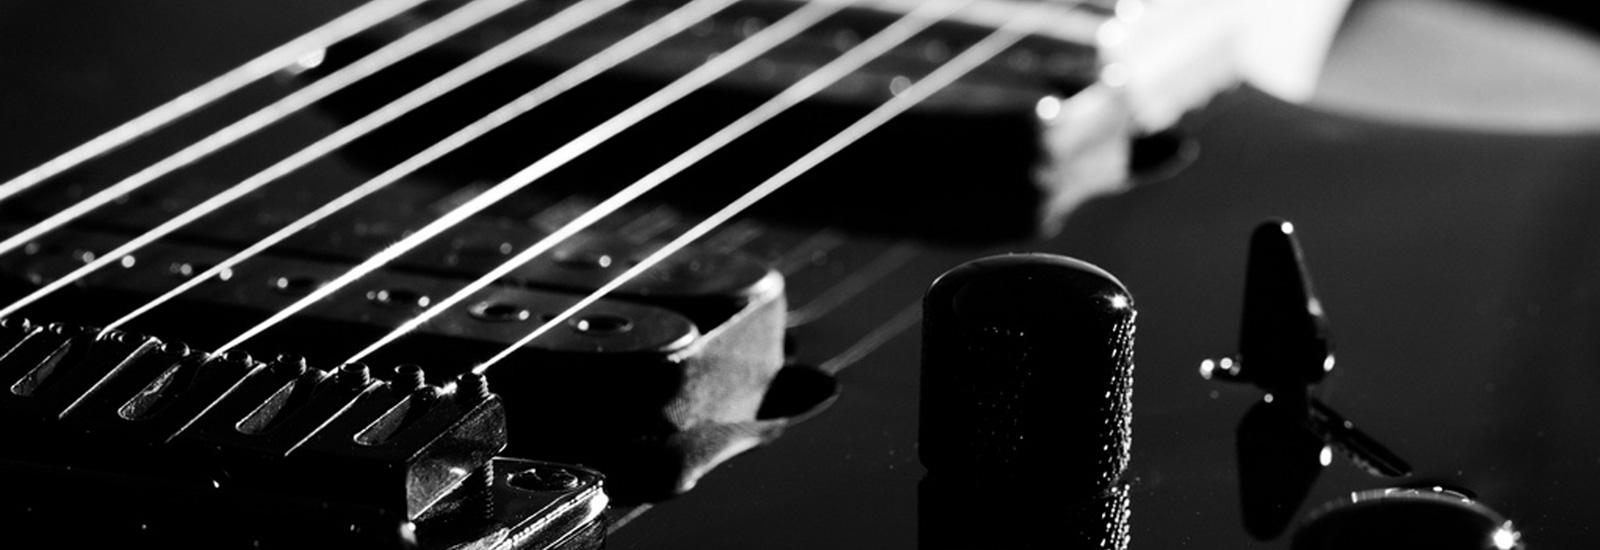 Musical universe